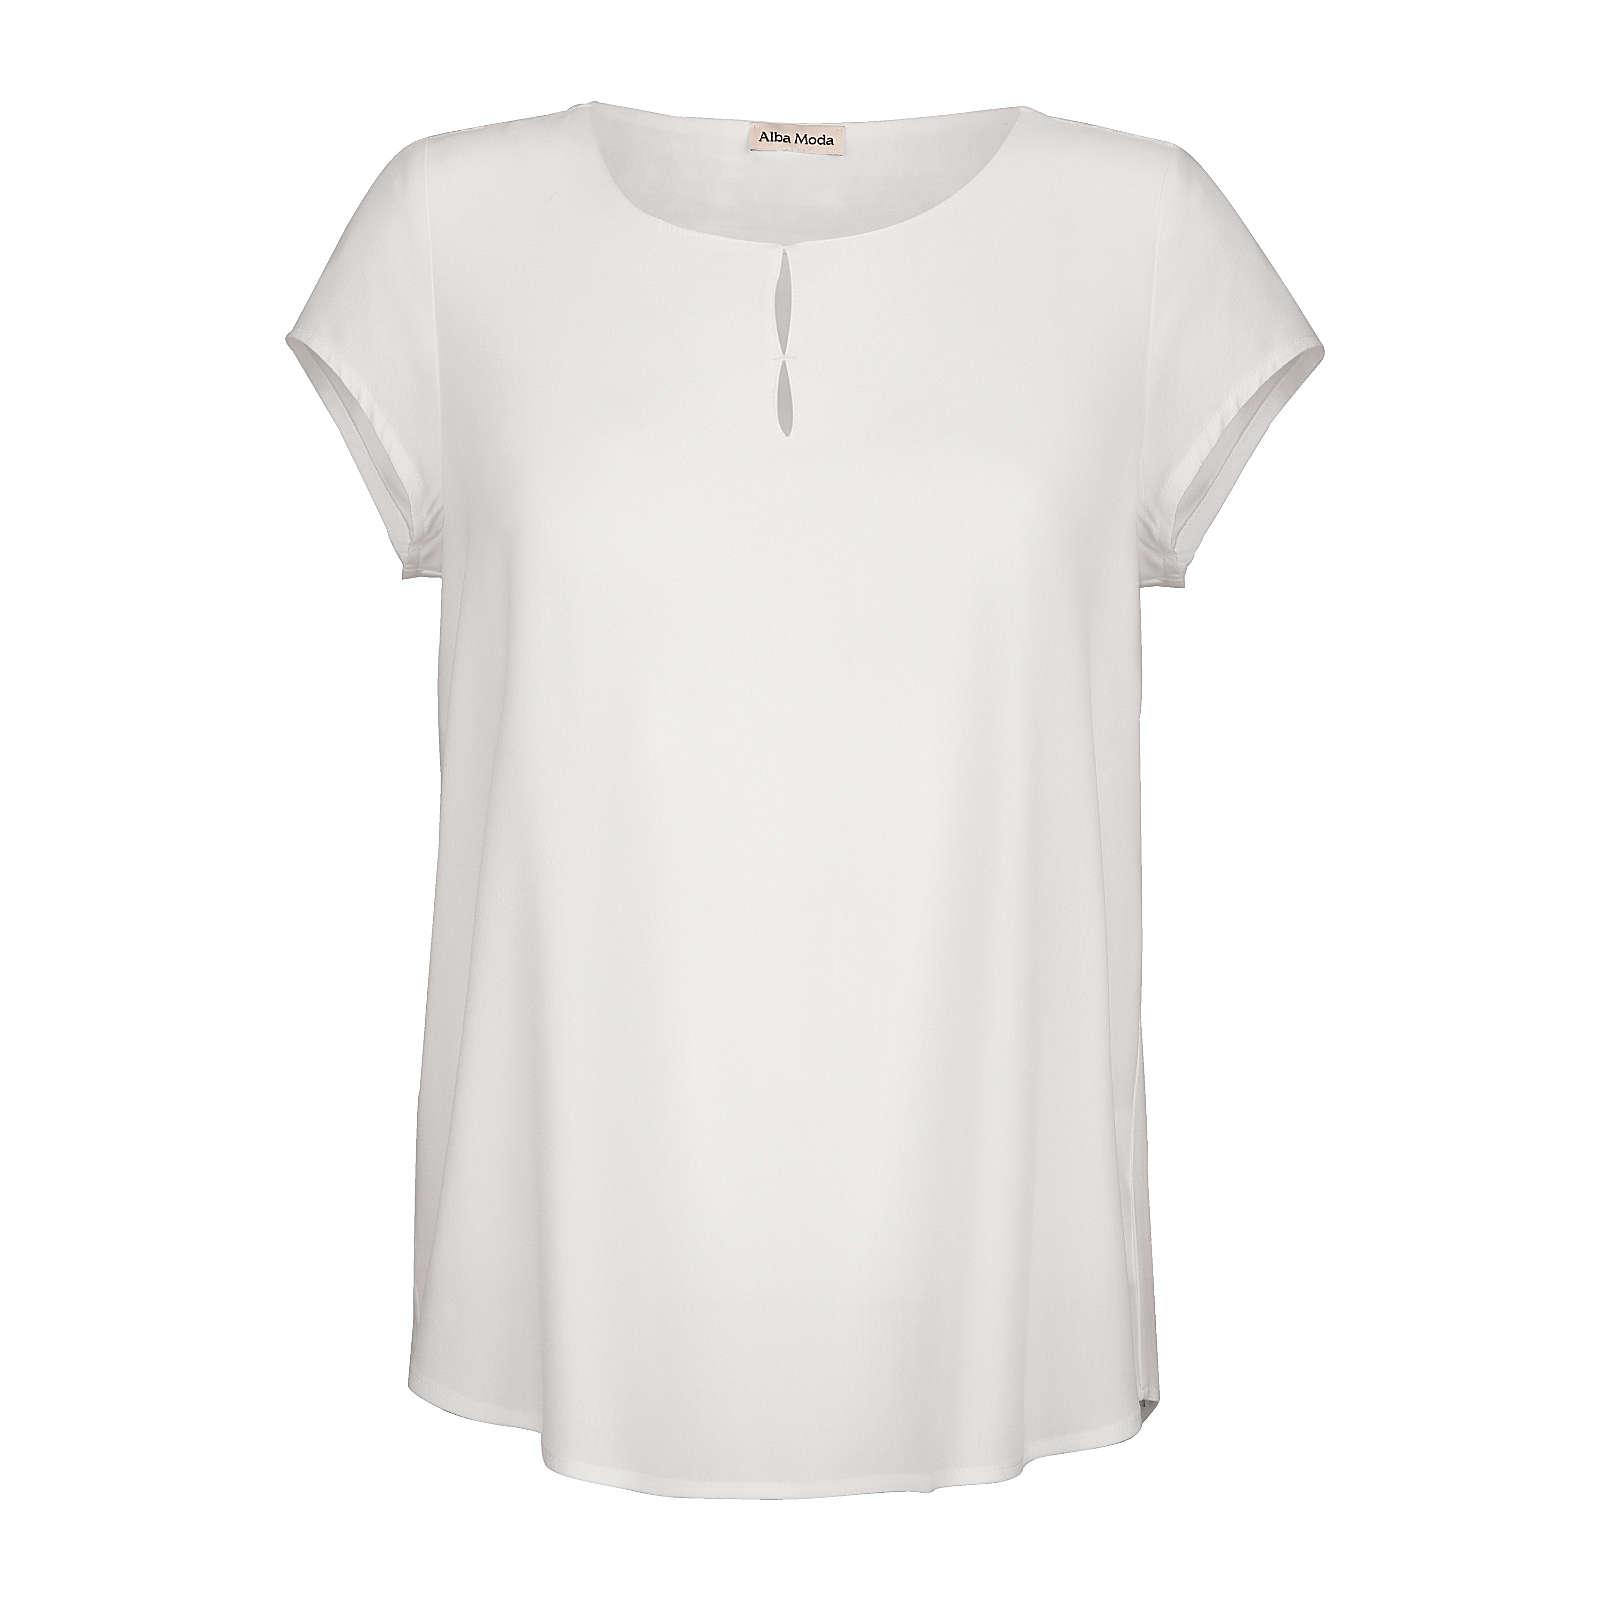 Alba Moda Bluse weiß Damen Gr. 36